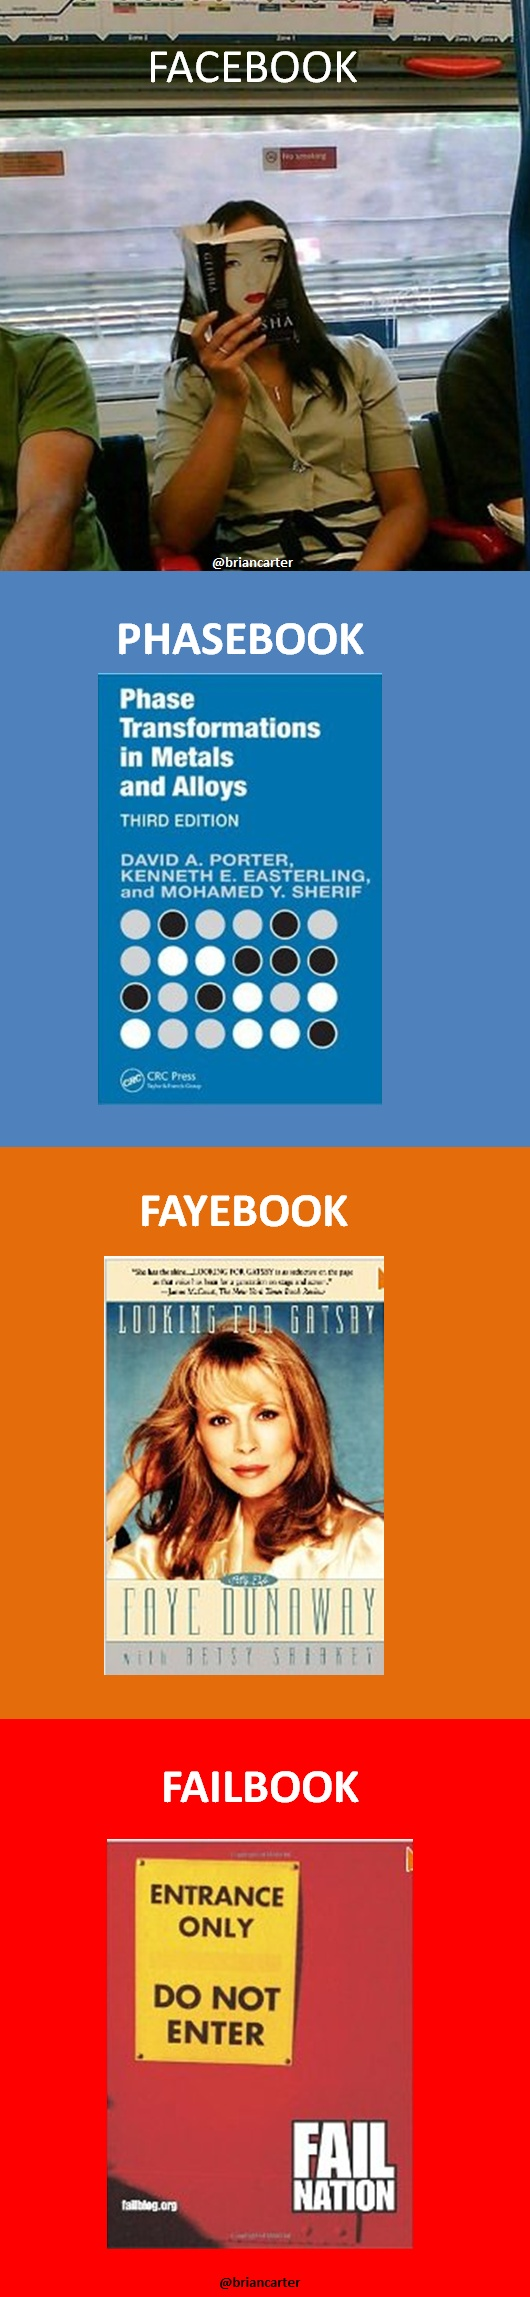 Facebook(s)